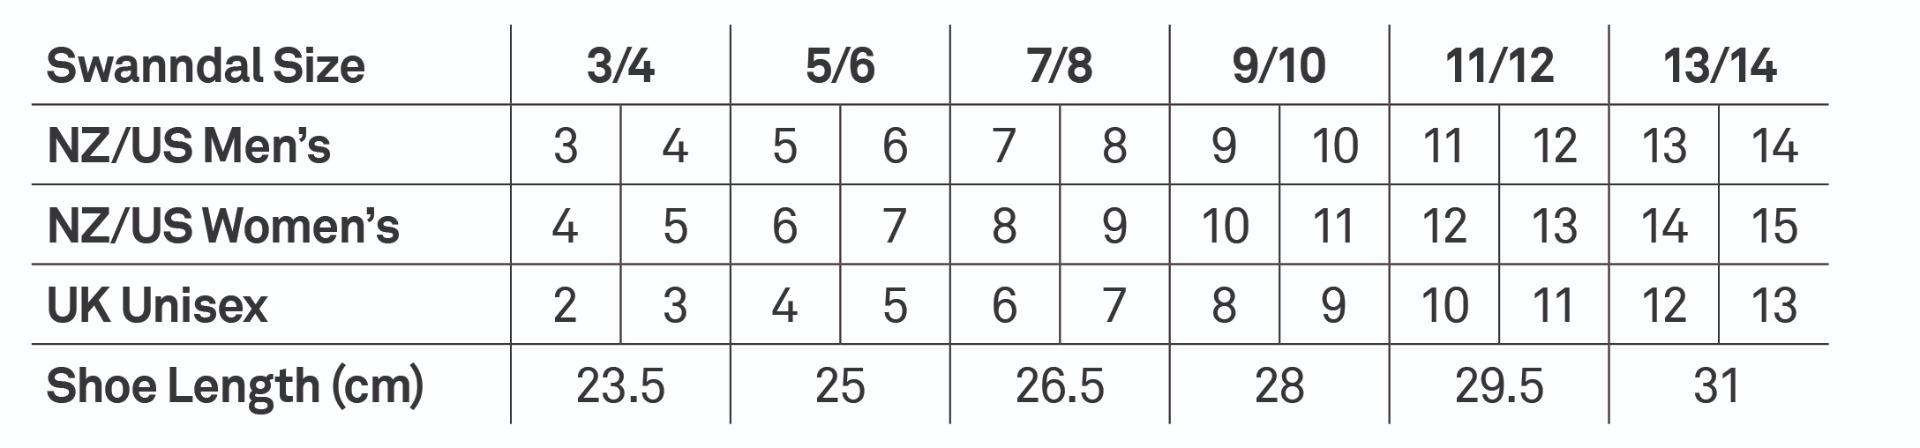 Swanndal Size Chart